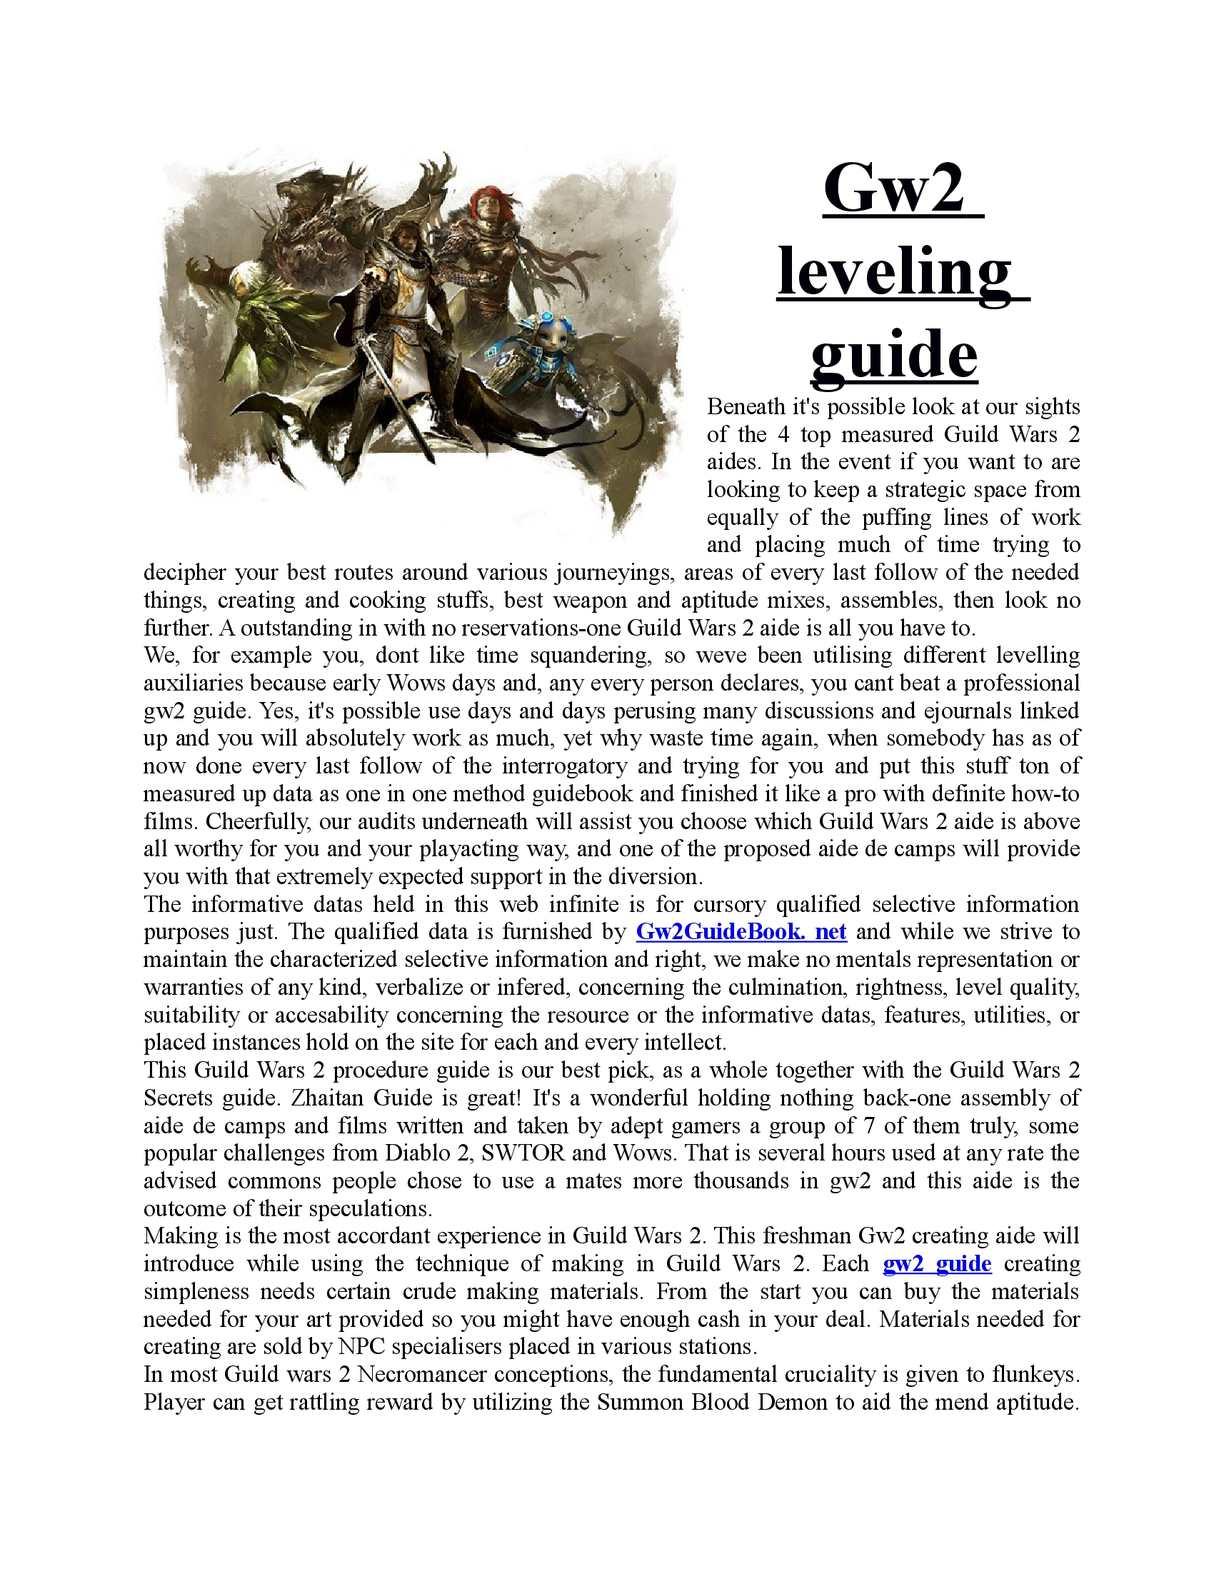 Calaméo - Guild wars 2 guide